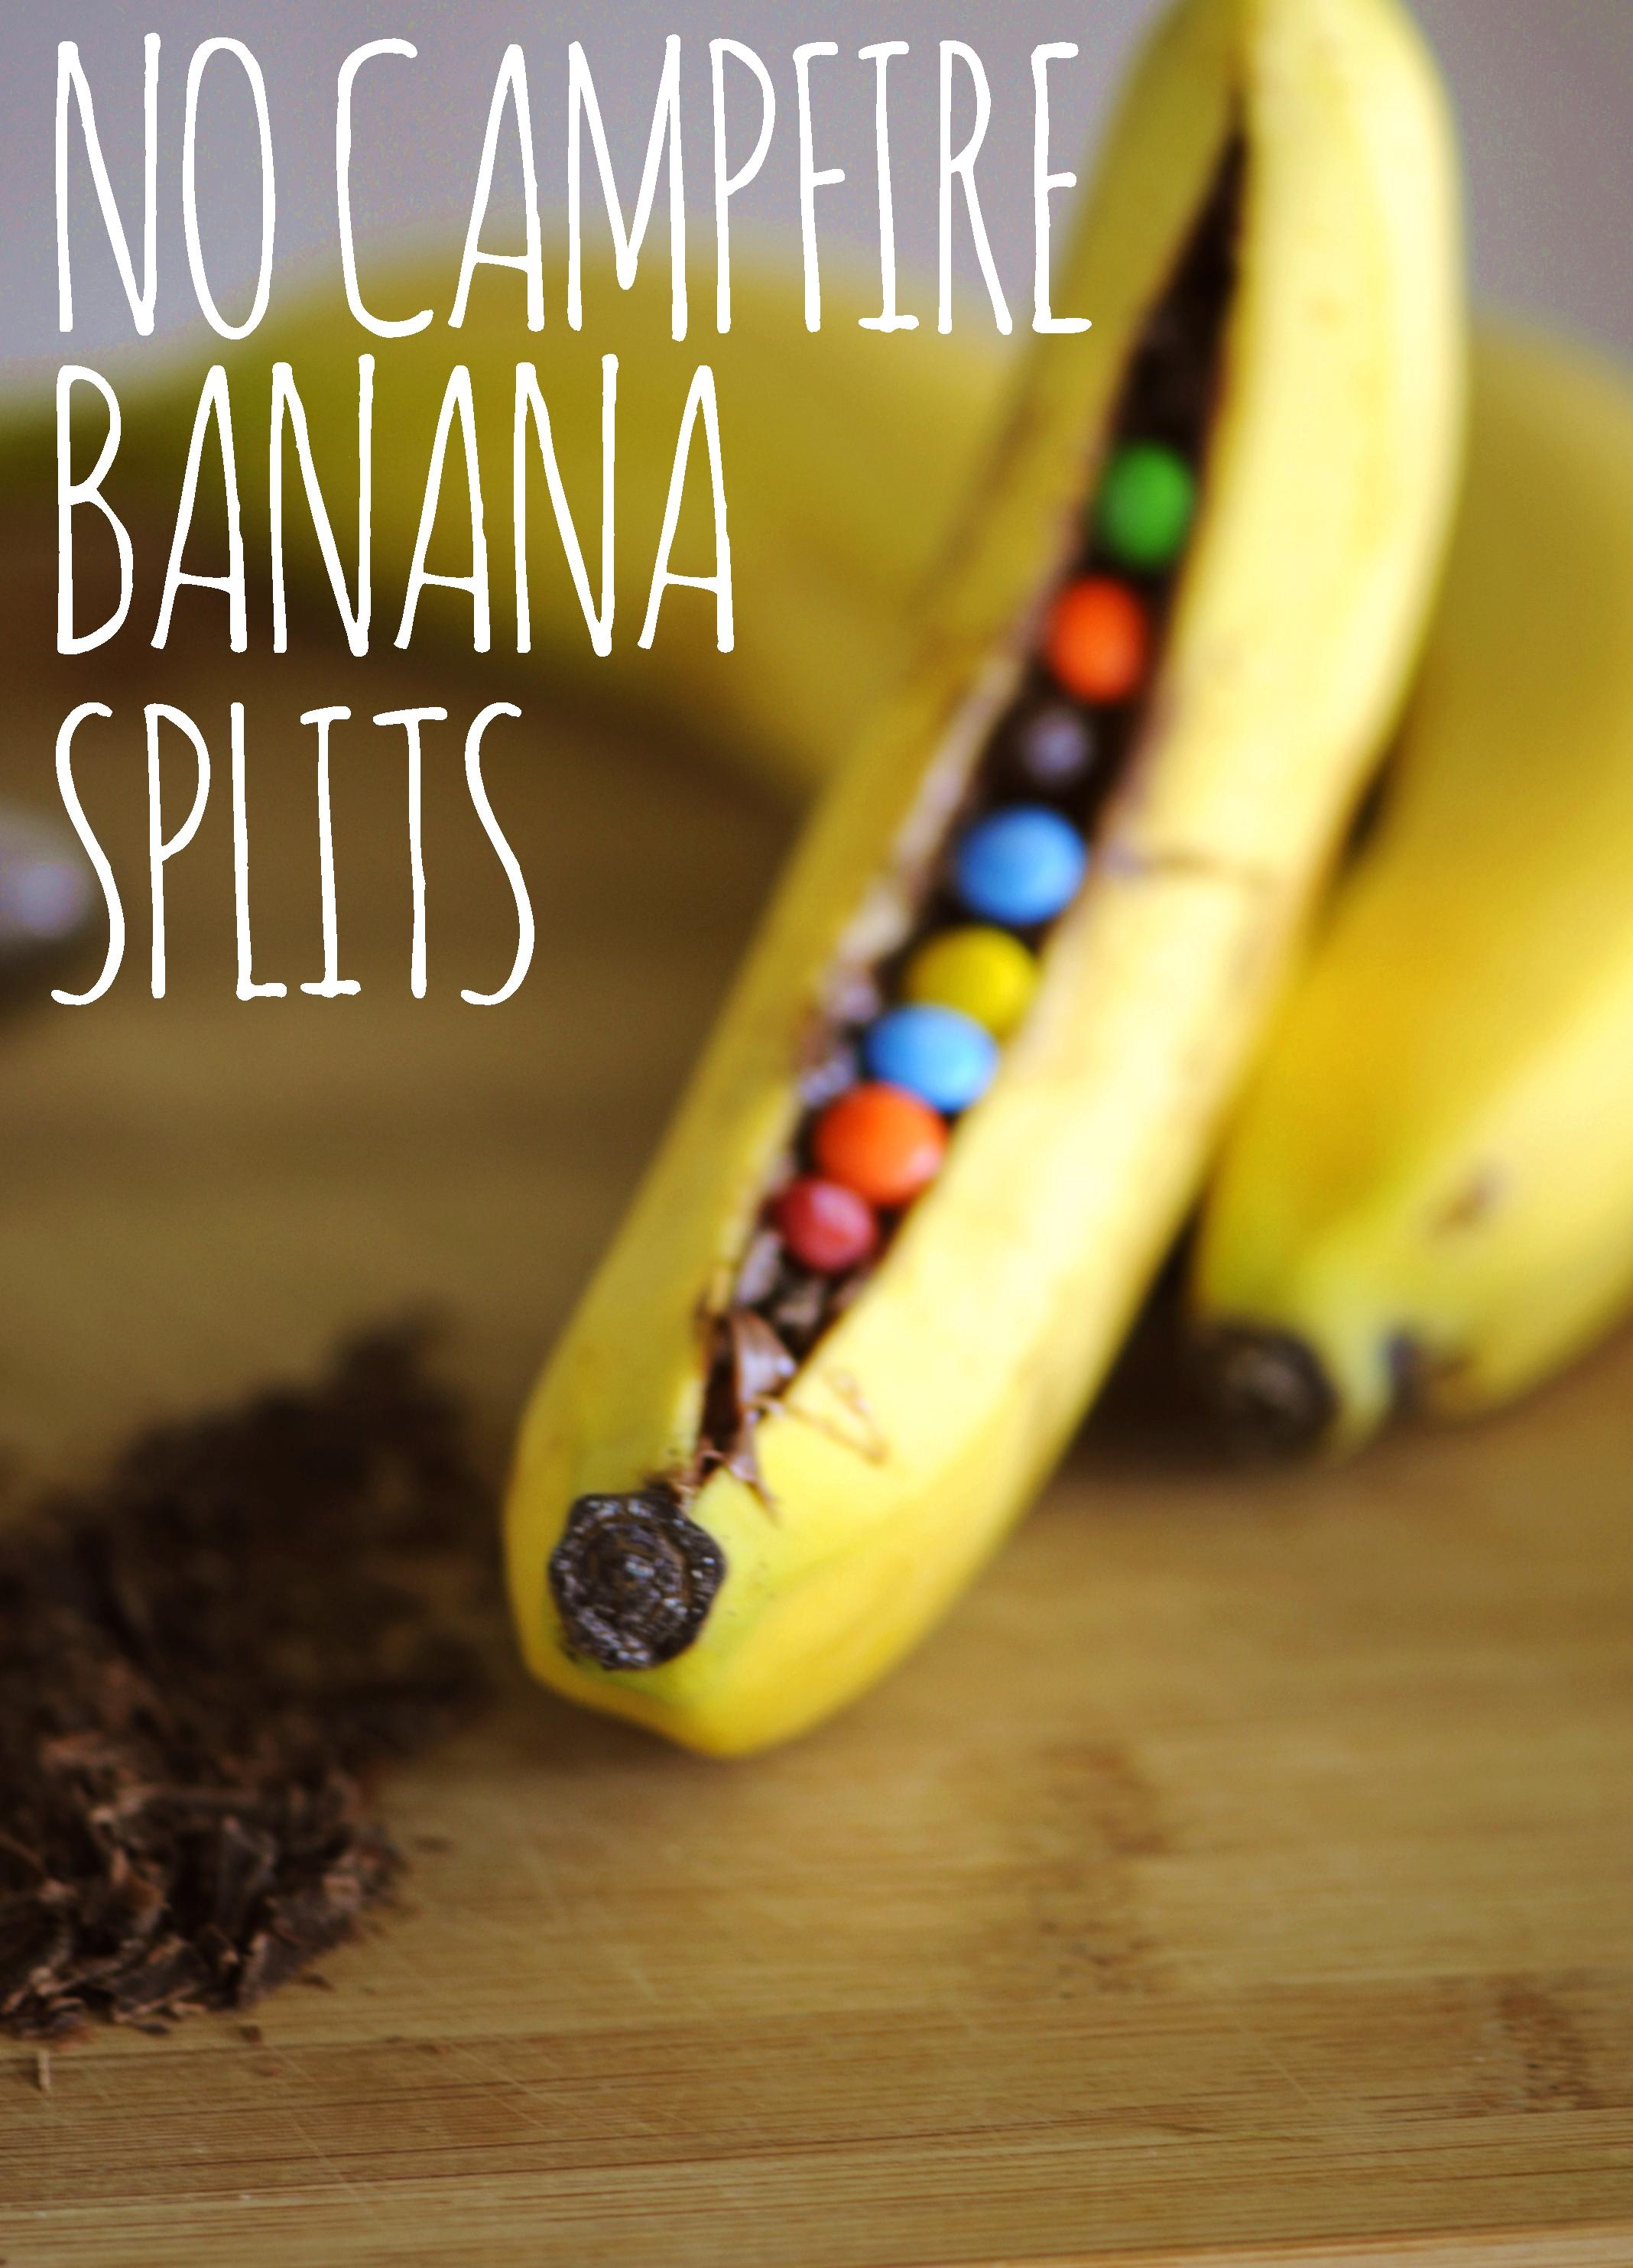 No Campfire Banana Splits